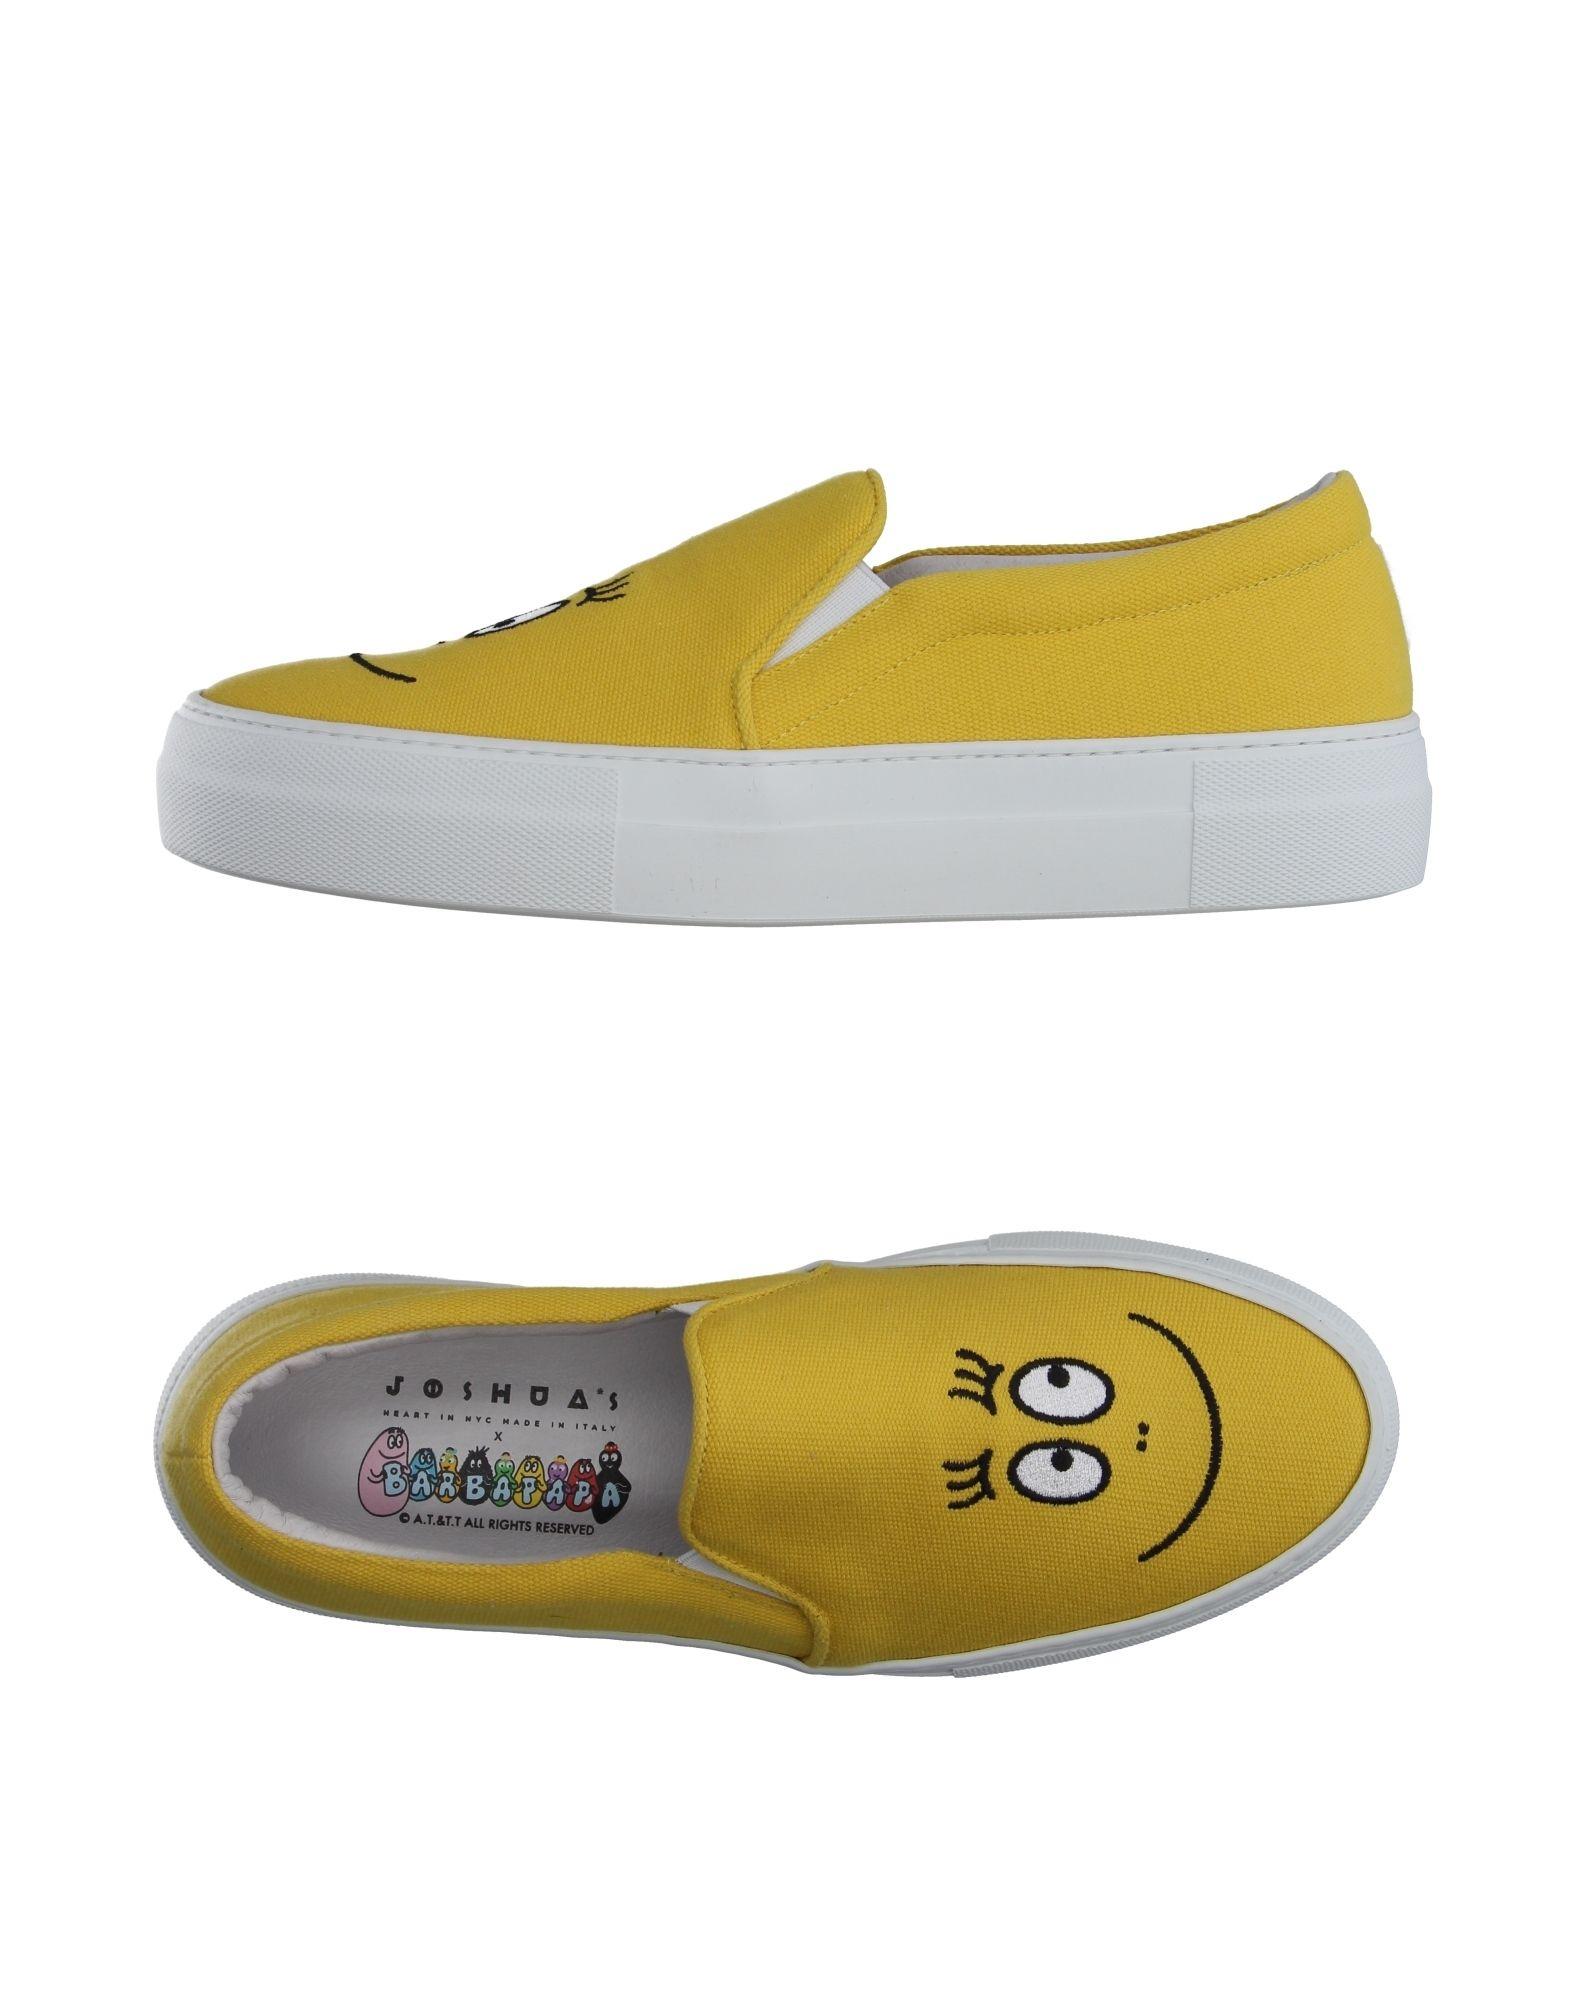 Joshua*S X Barbapapa Sneakers Damen  11136556DRGut aussehende strapazierfähige Schuhe